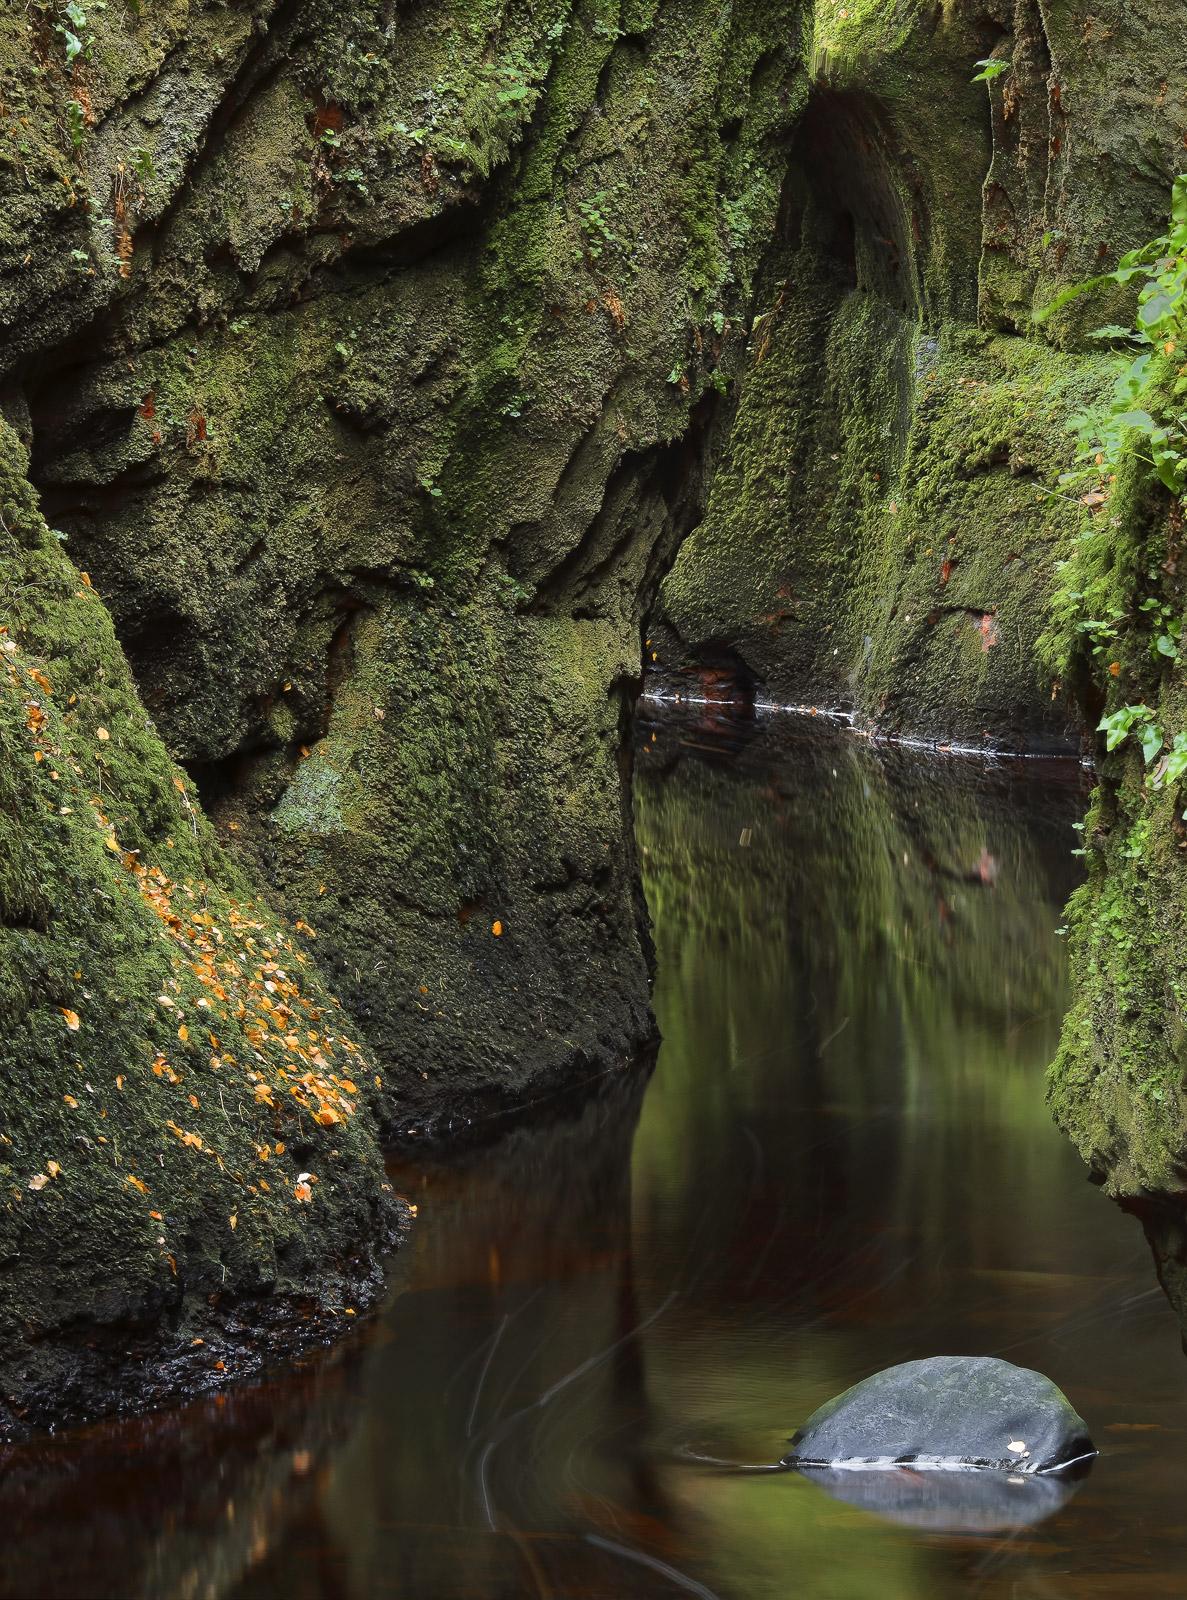 Emerald Gorge, Finnich Glen, Trossachs, Scotland, curtains, hanging, moss, gorge, meandering, lost, grey, stone, peaty, , photo